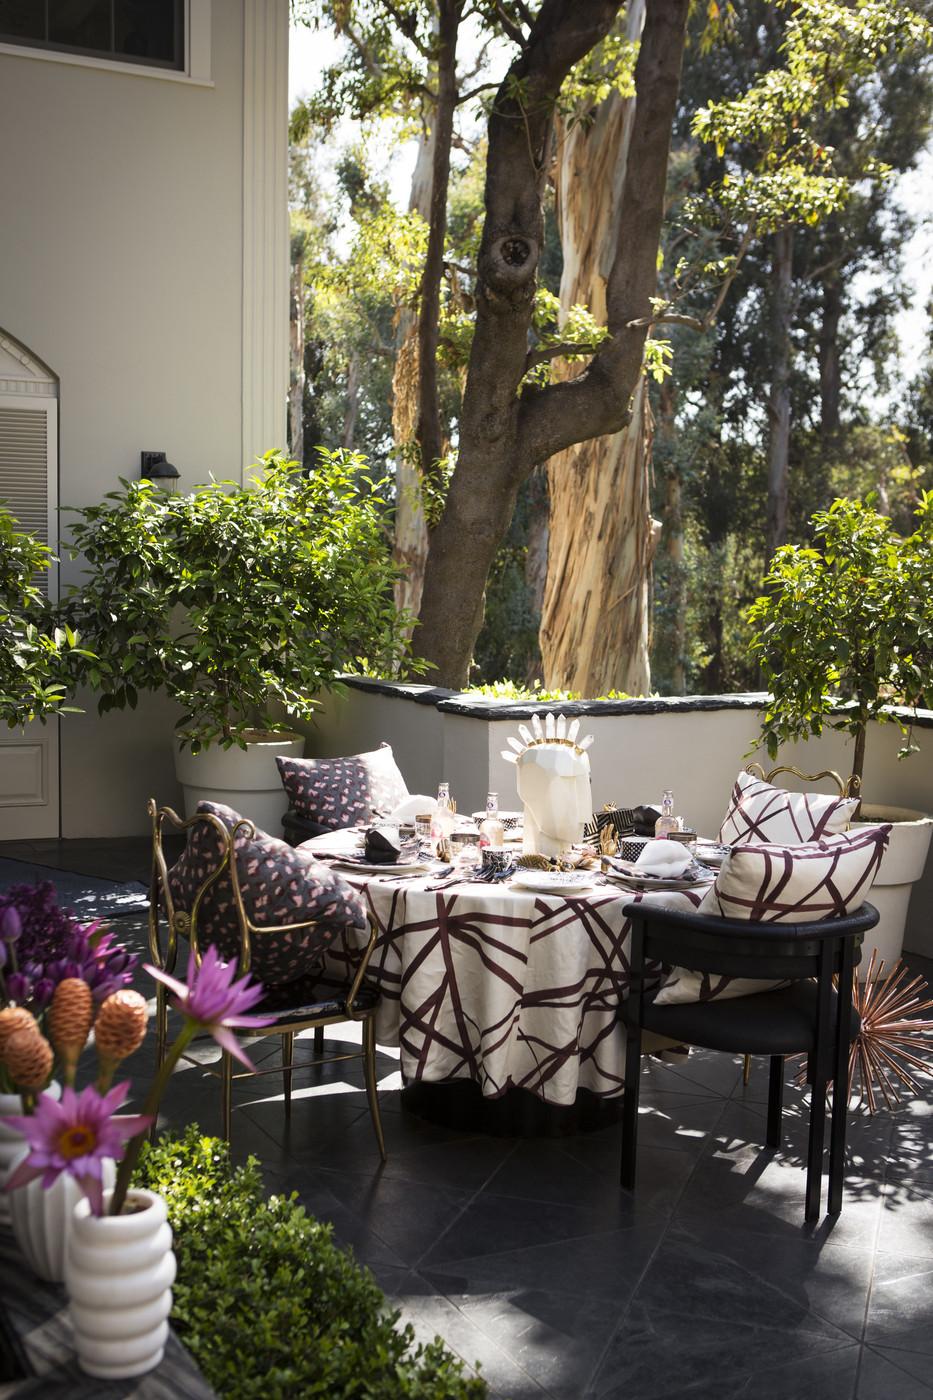 Kelly Wearstler Outdoor Table Setting, Lonny Magazine